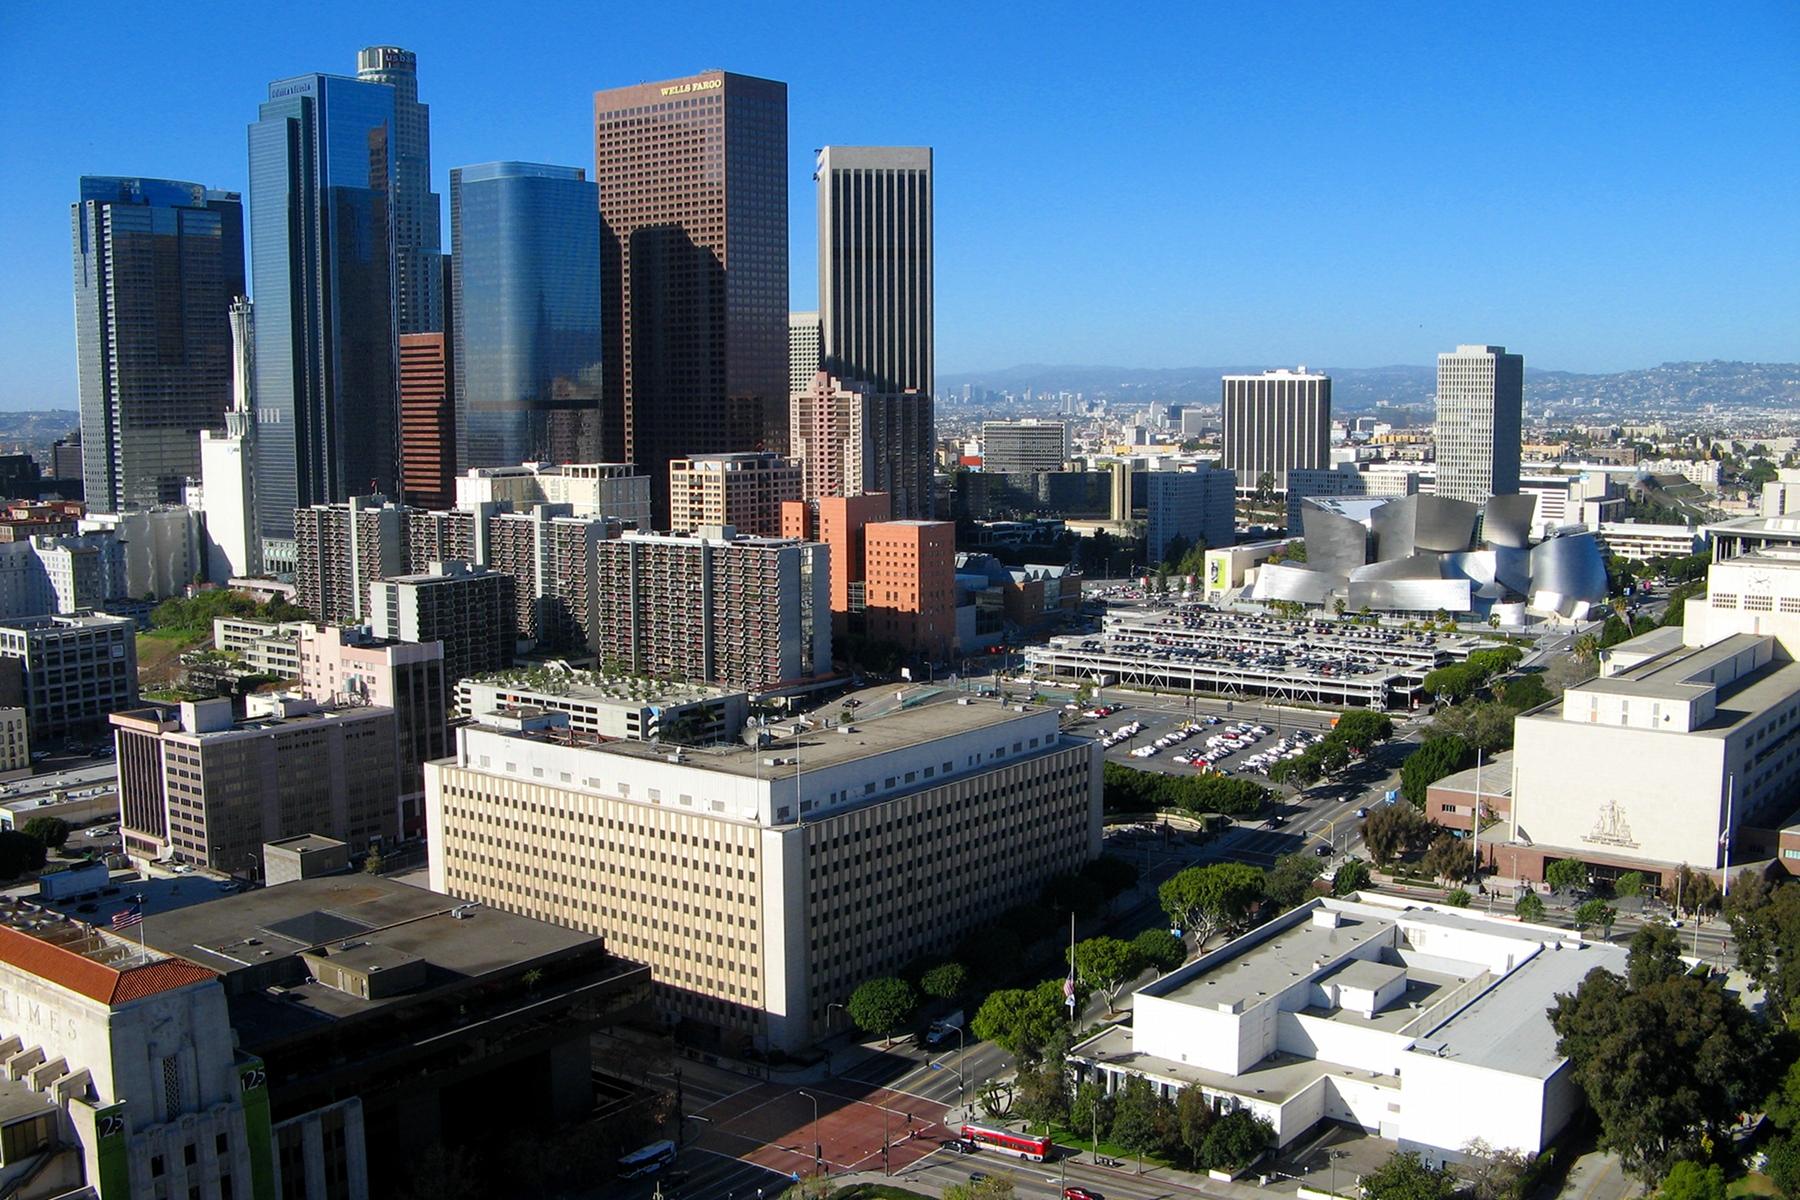 San Pedro (Los Angeles), California